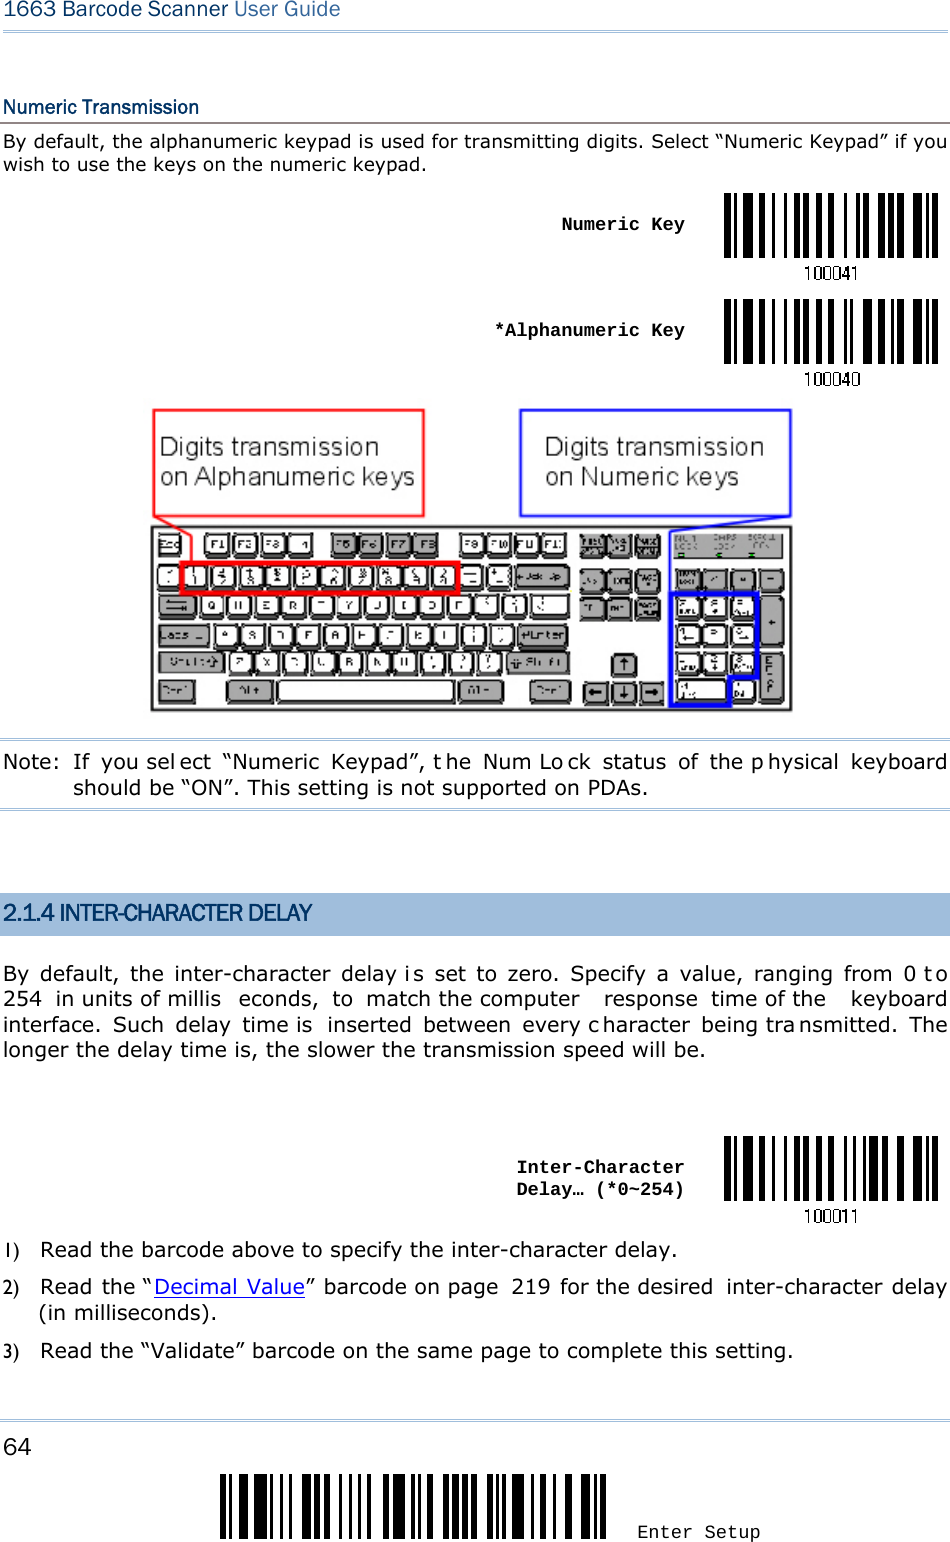 CipherLab 1663 Bluetooth Barcode Scanner User Manual 1663